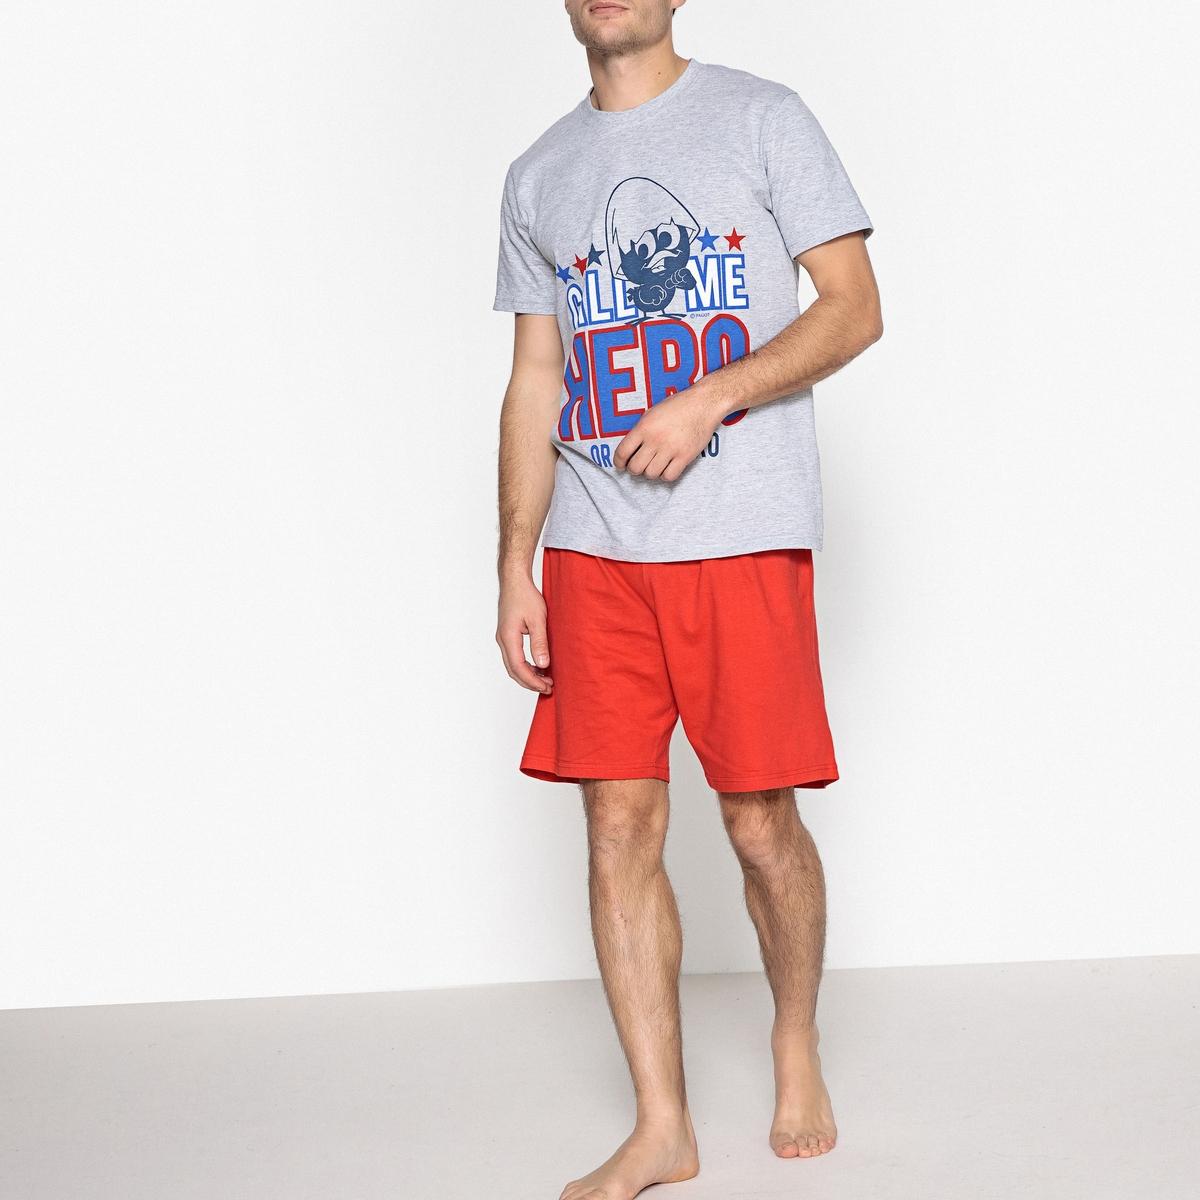 Пижама с шортами с рисунком solo1 с